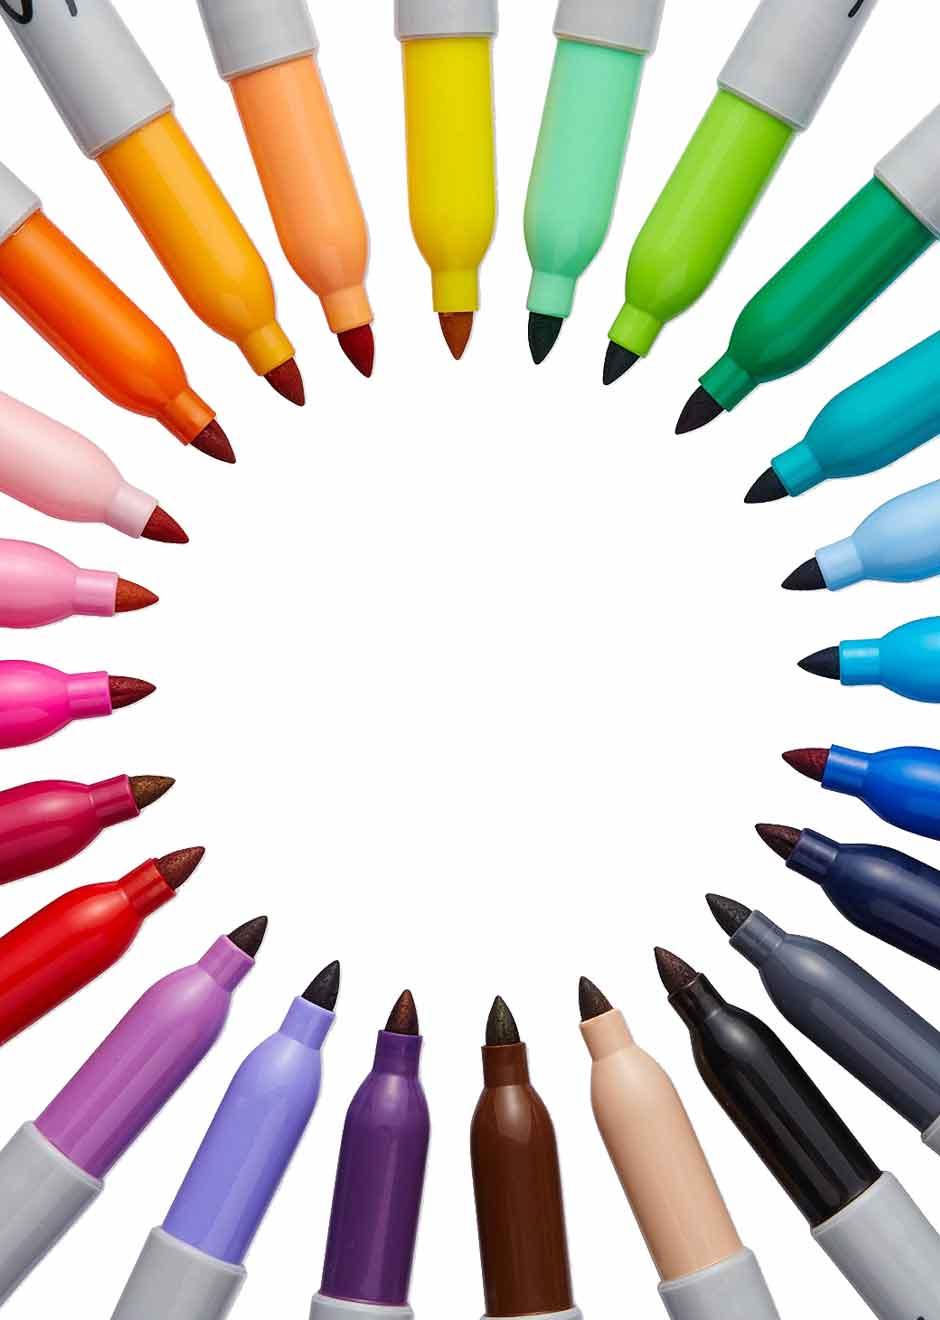 sharpie-fine-marker-24-colors